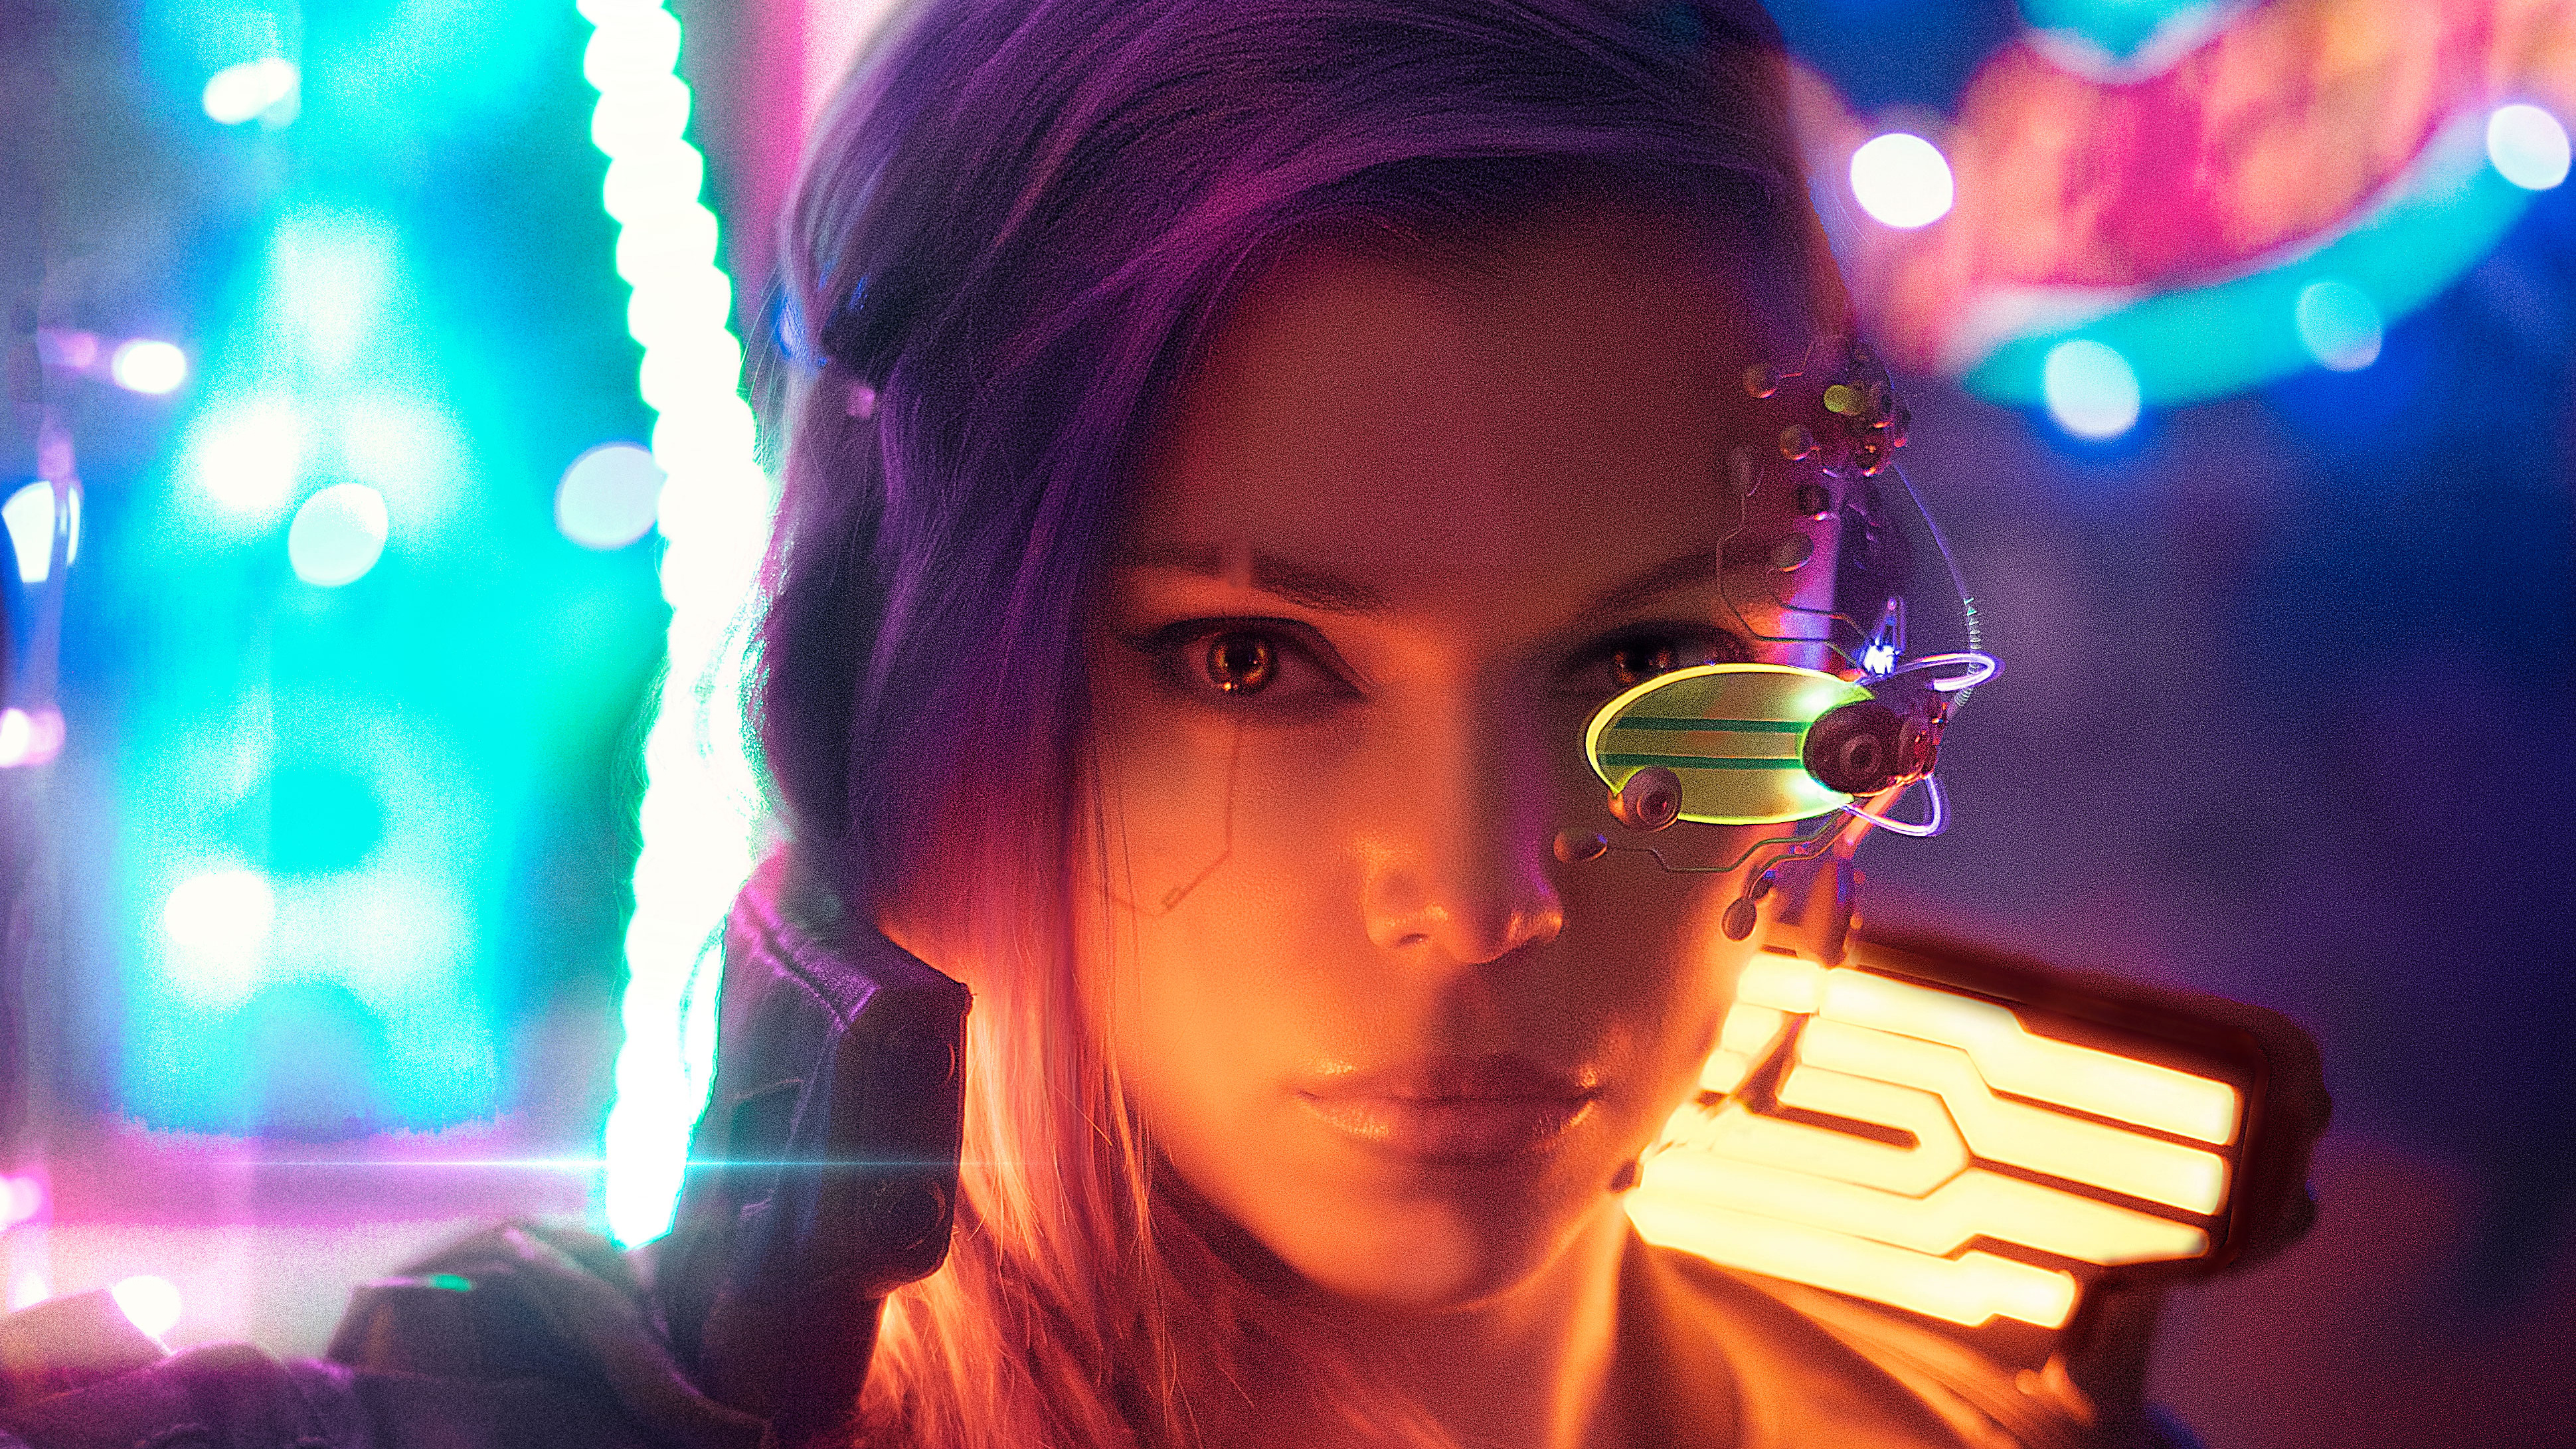 Cyberpunk Girl Cosplay 4k, HD Fantasy Girls, 4k Wallpapers ...